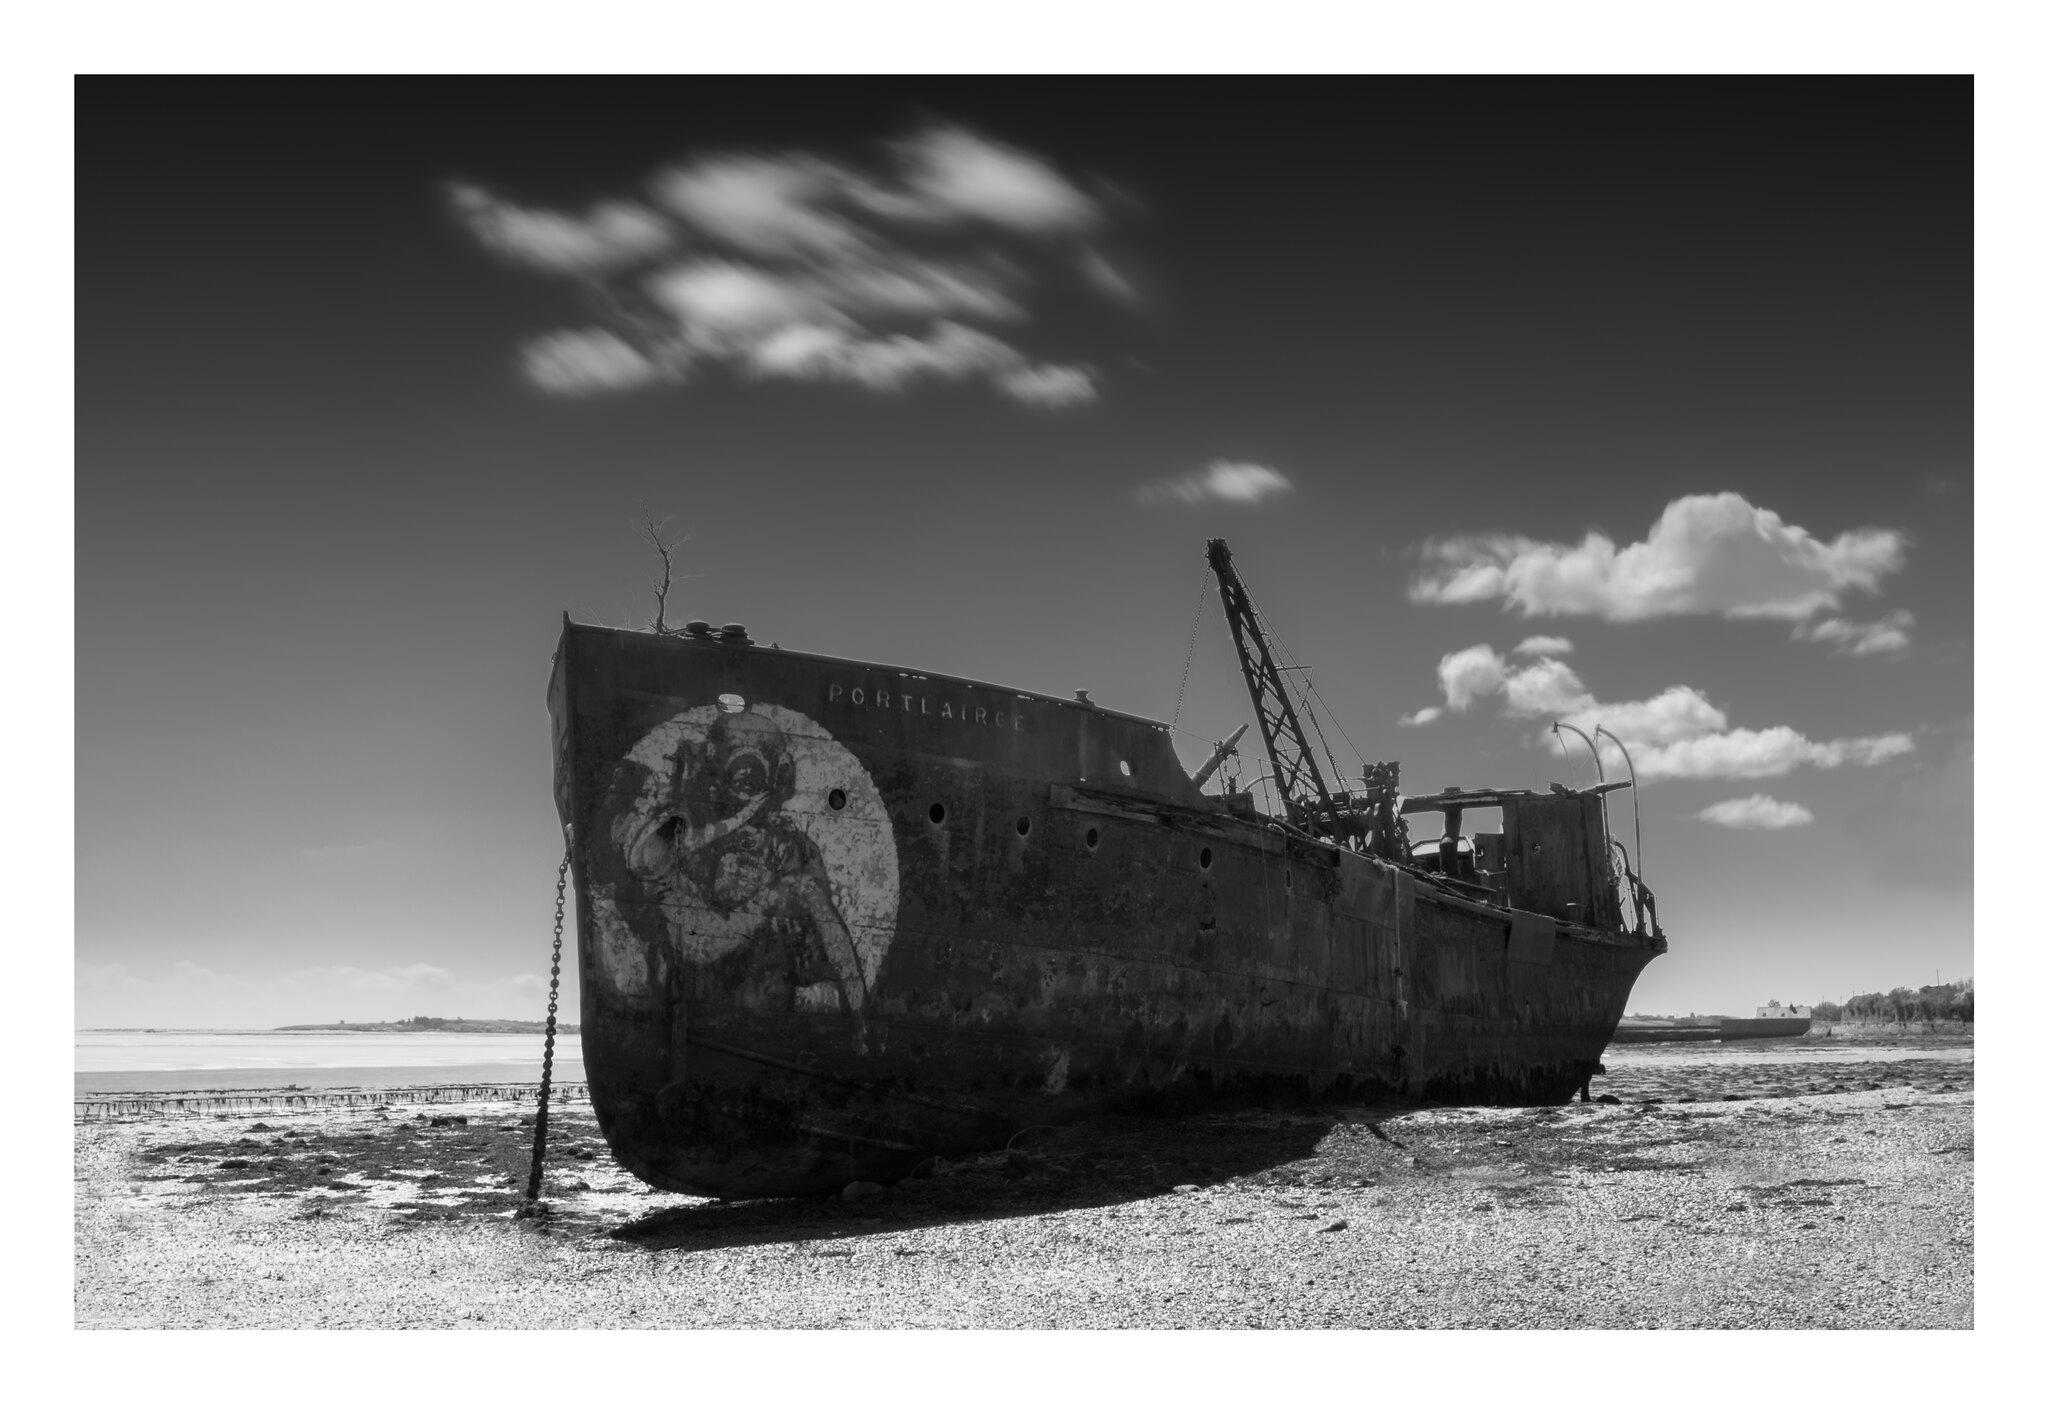 Portlairge wreck saltmines wexford 1 (10).jpg